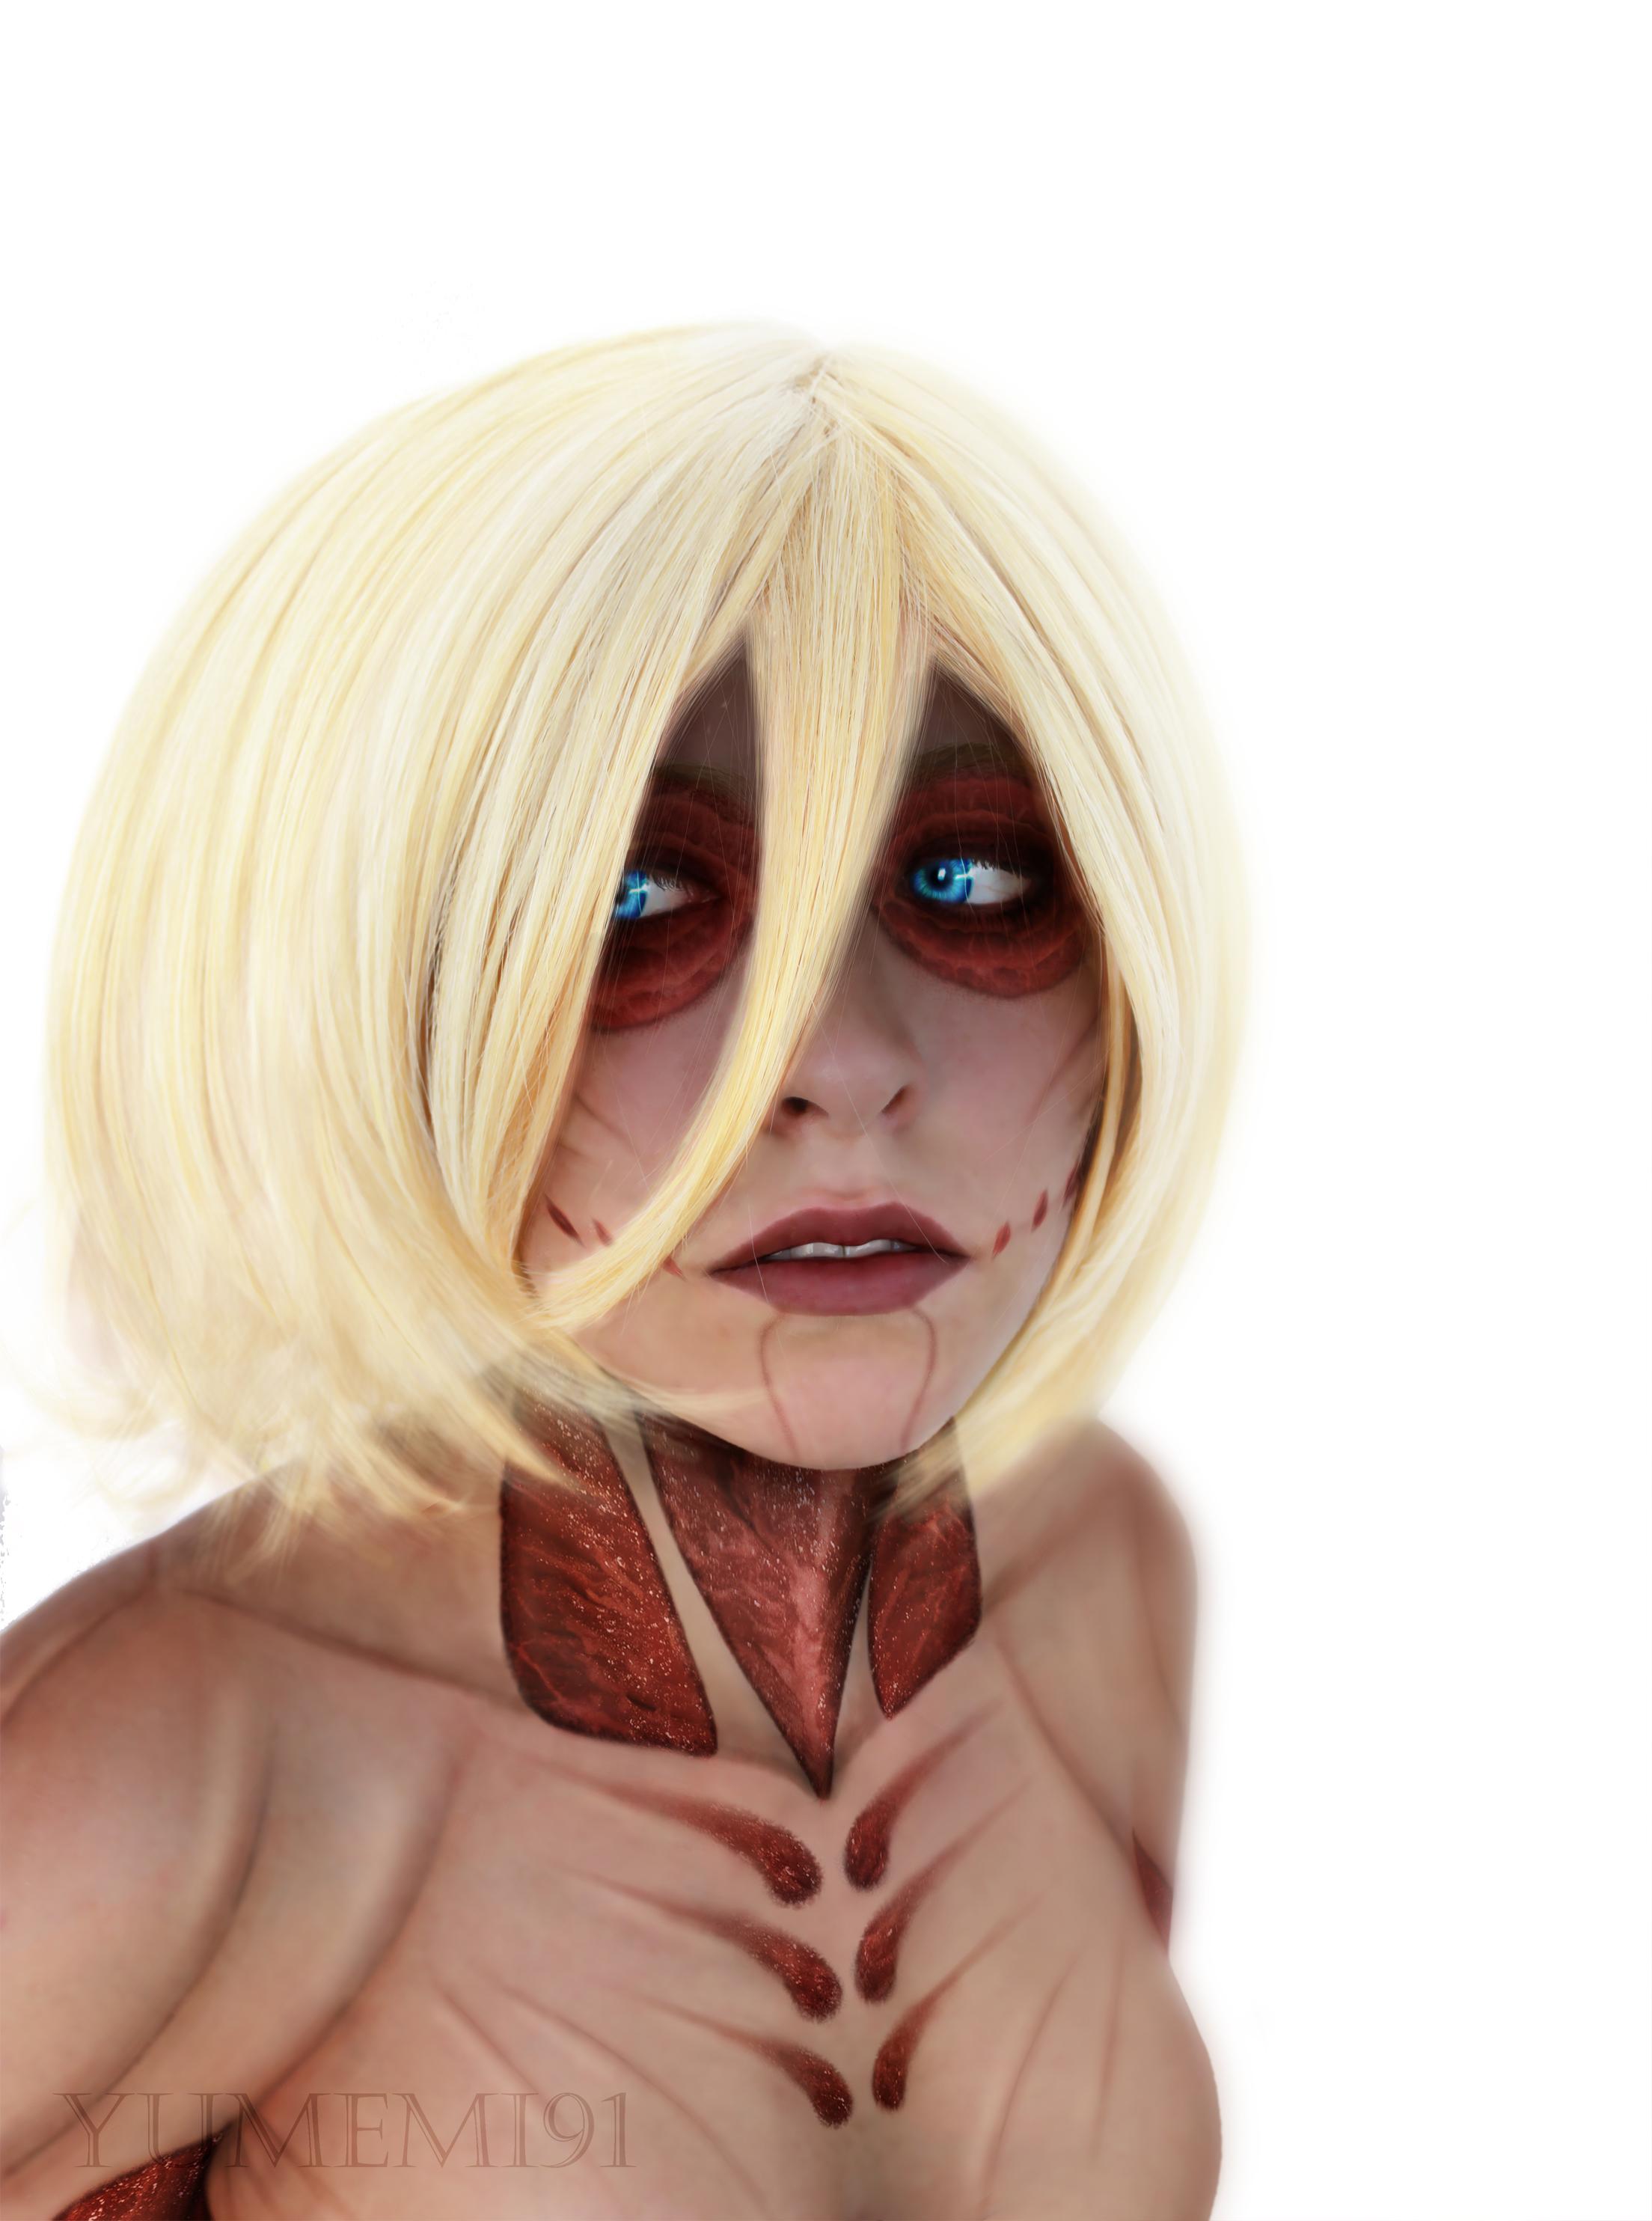 Female Titan by Yumemi91